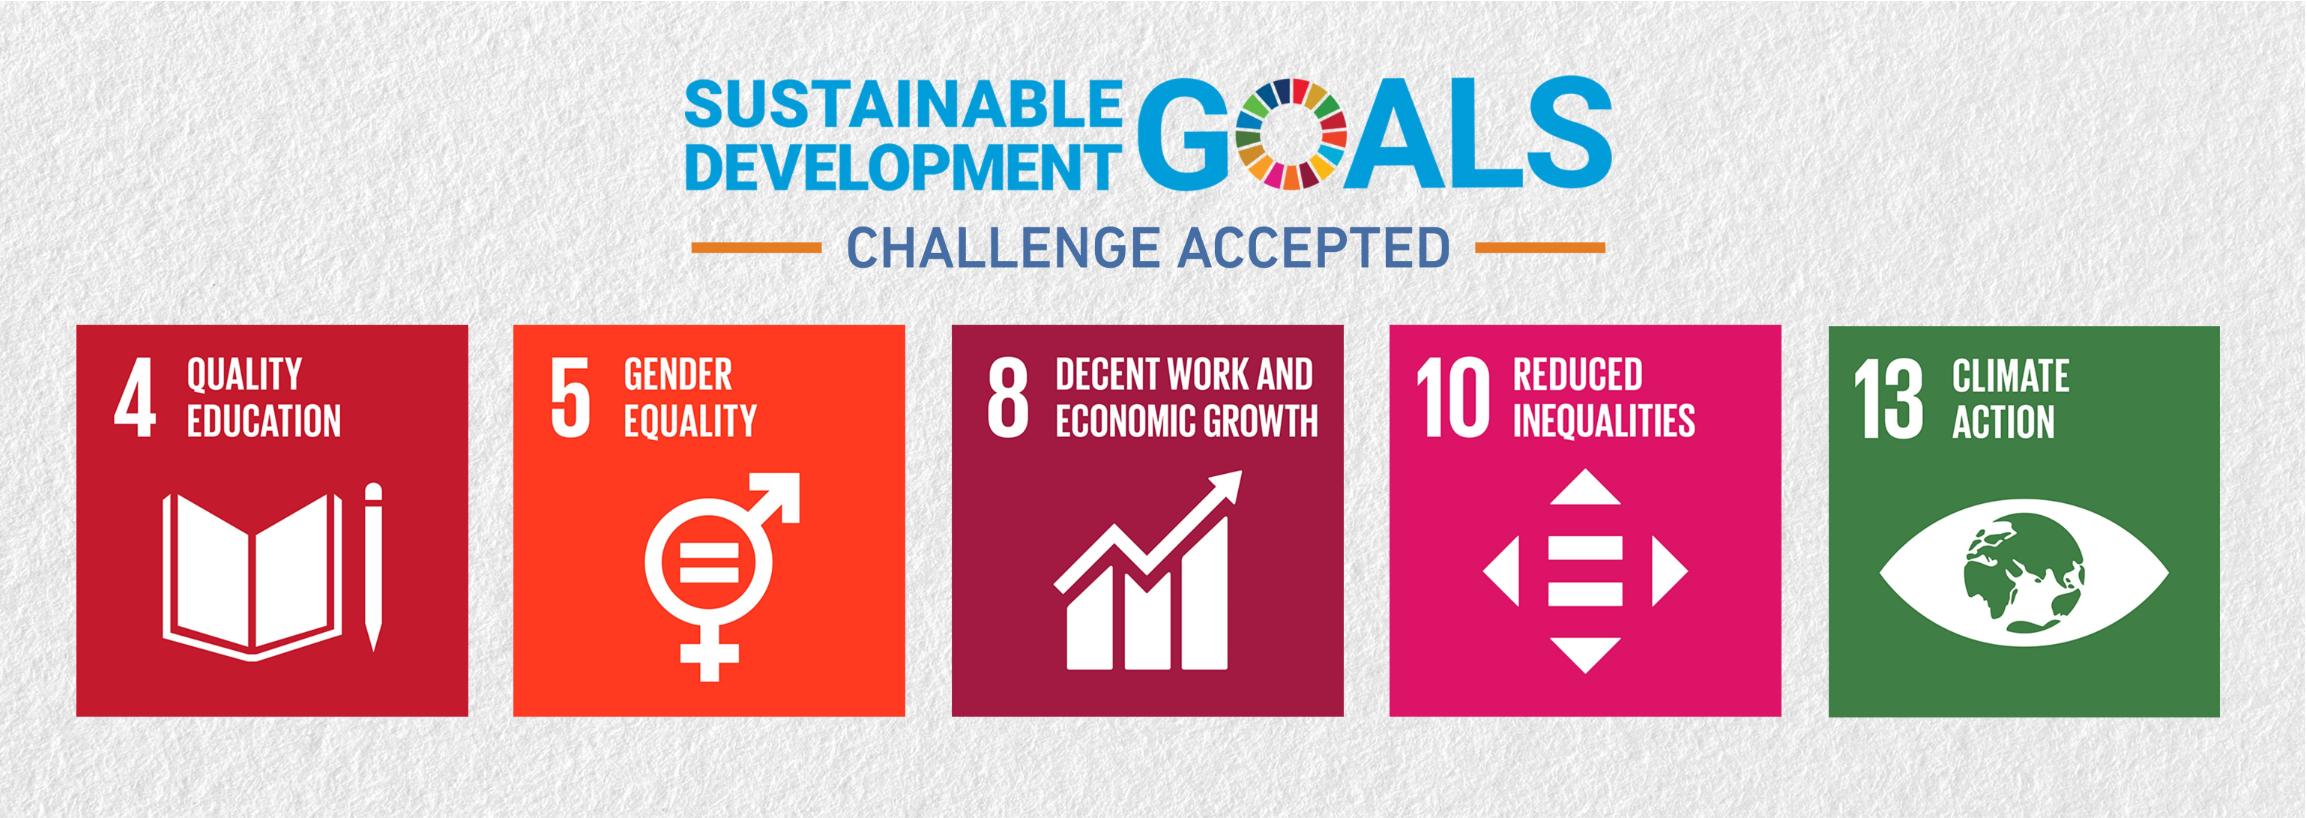 ManpowerGroup's Sustainable Development Goals